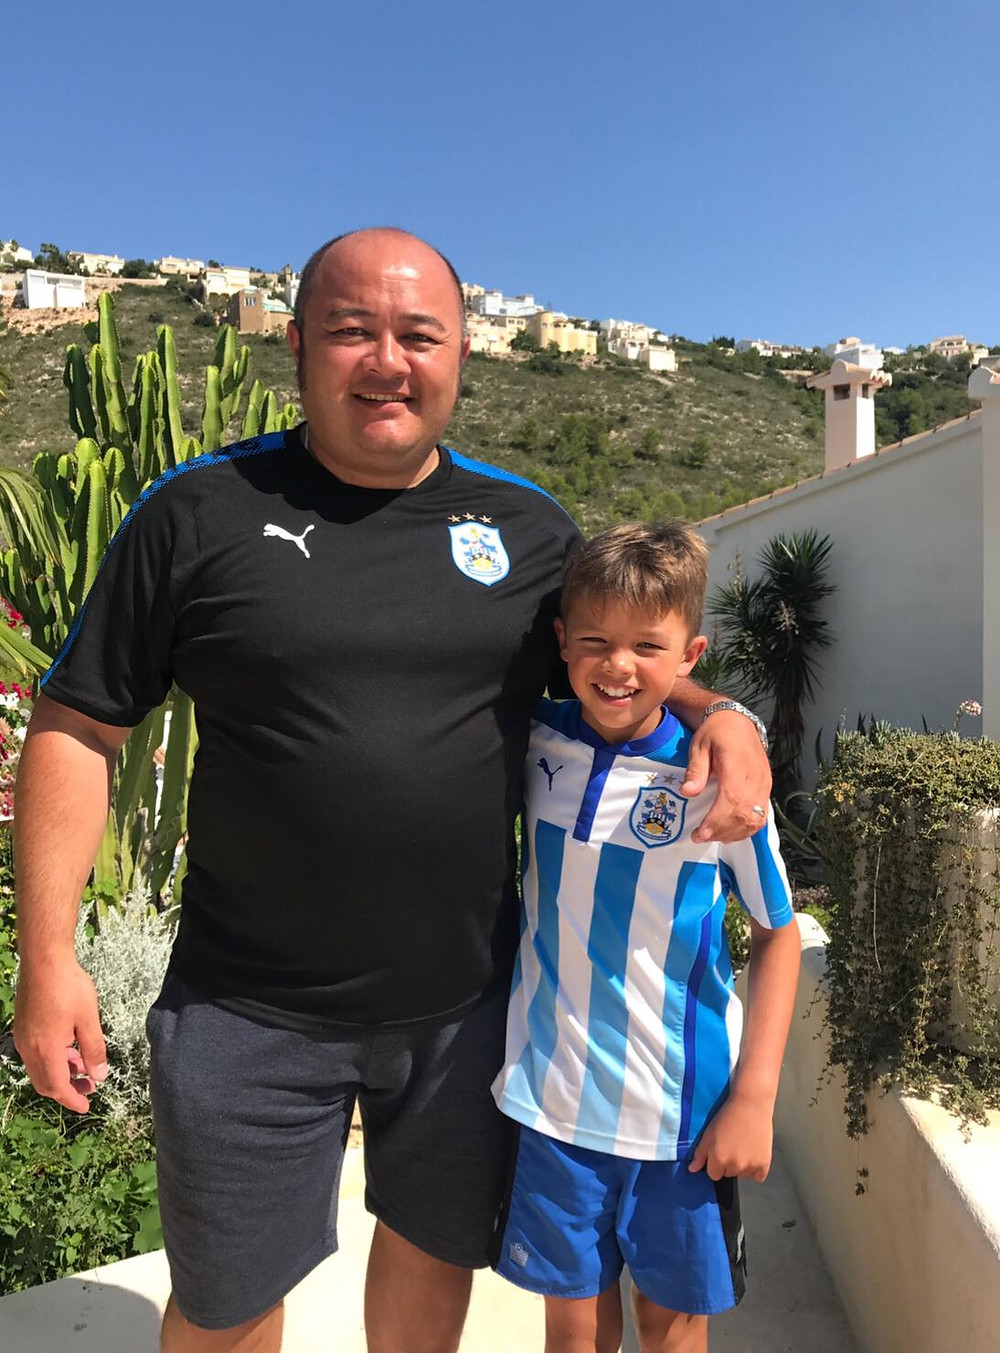 Simon & his son Charlie